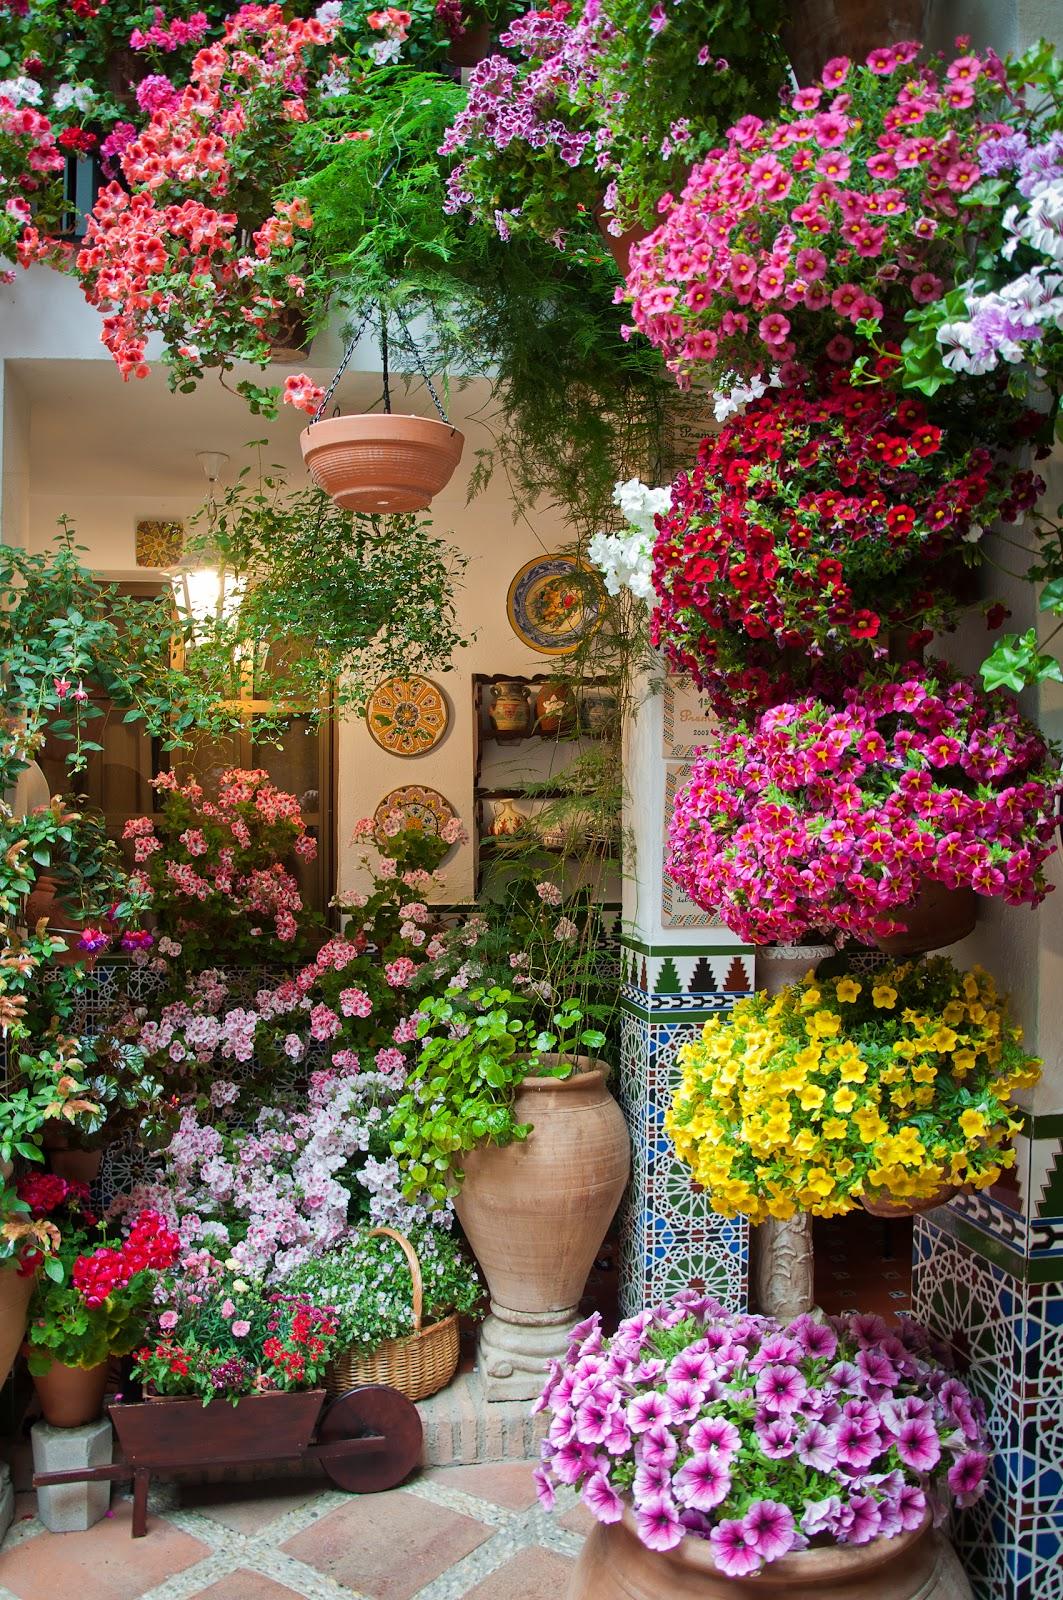 Candilazos patios cordobeses 2012 i for Beautiful flower garden designs